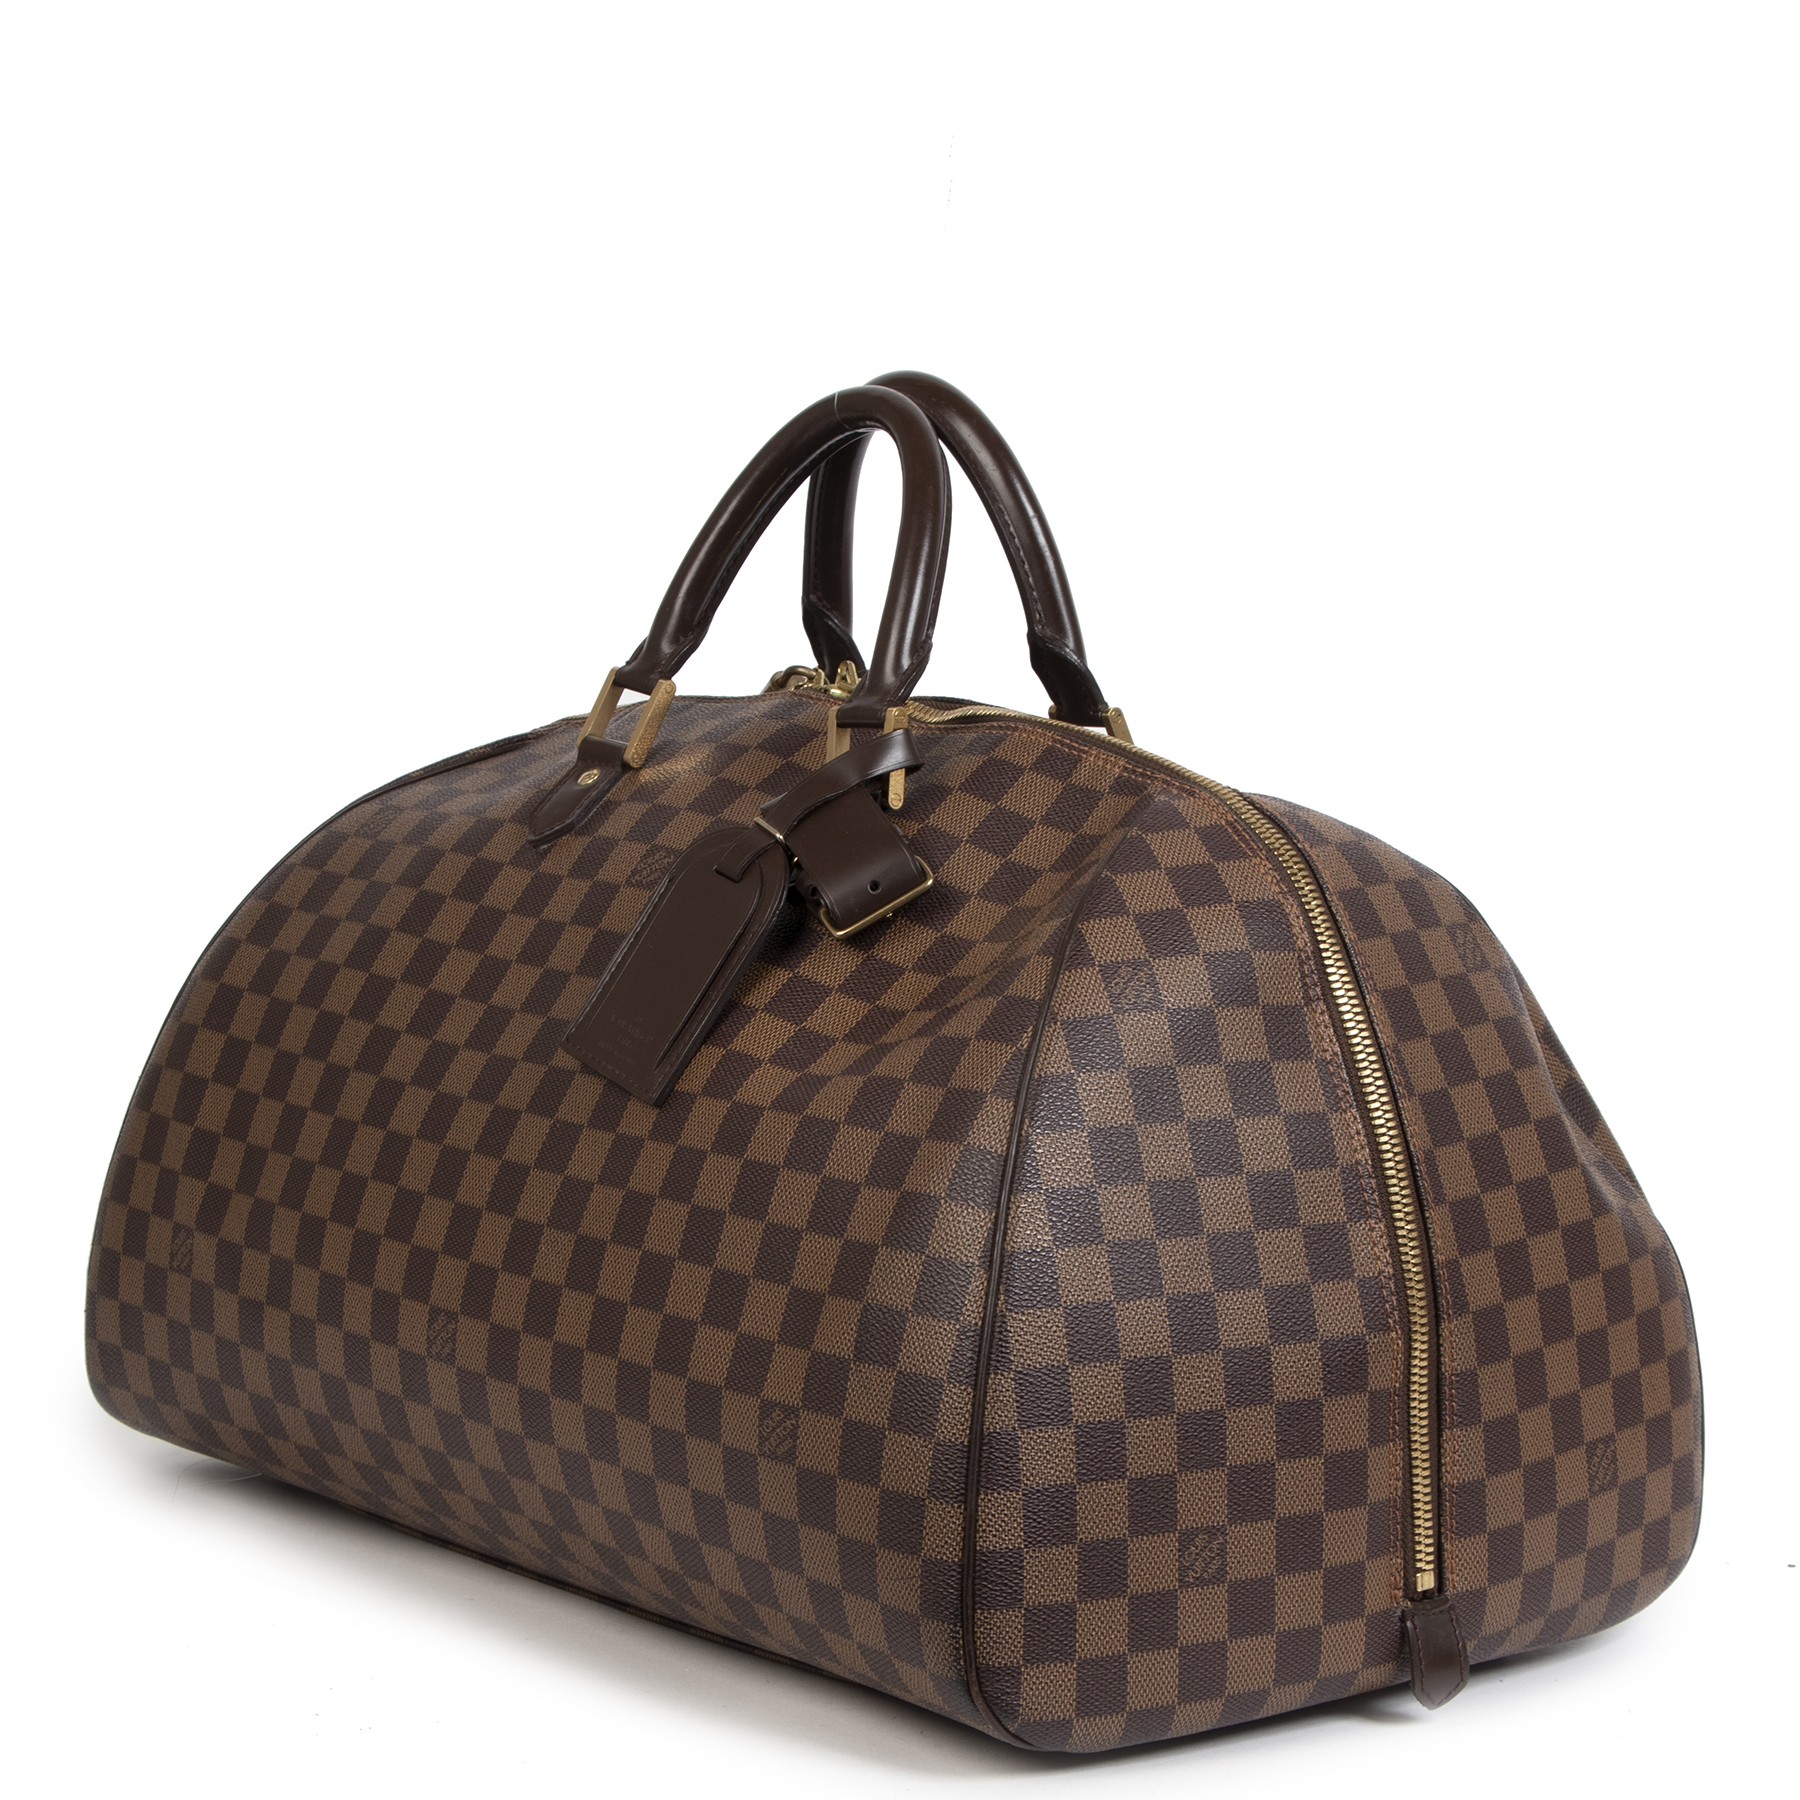 acheter en ligne seconde main Louis Vuitton Damier Ebene Ribera GM